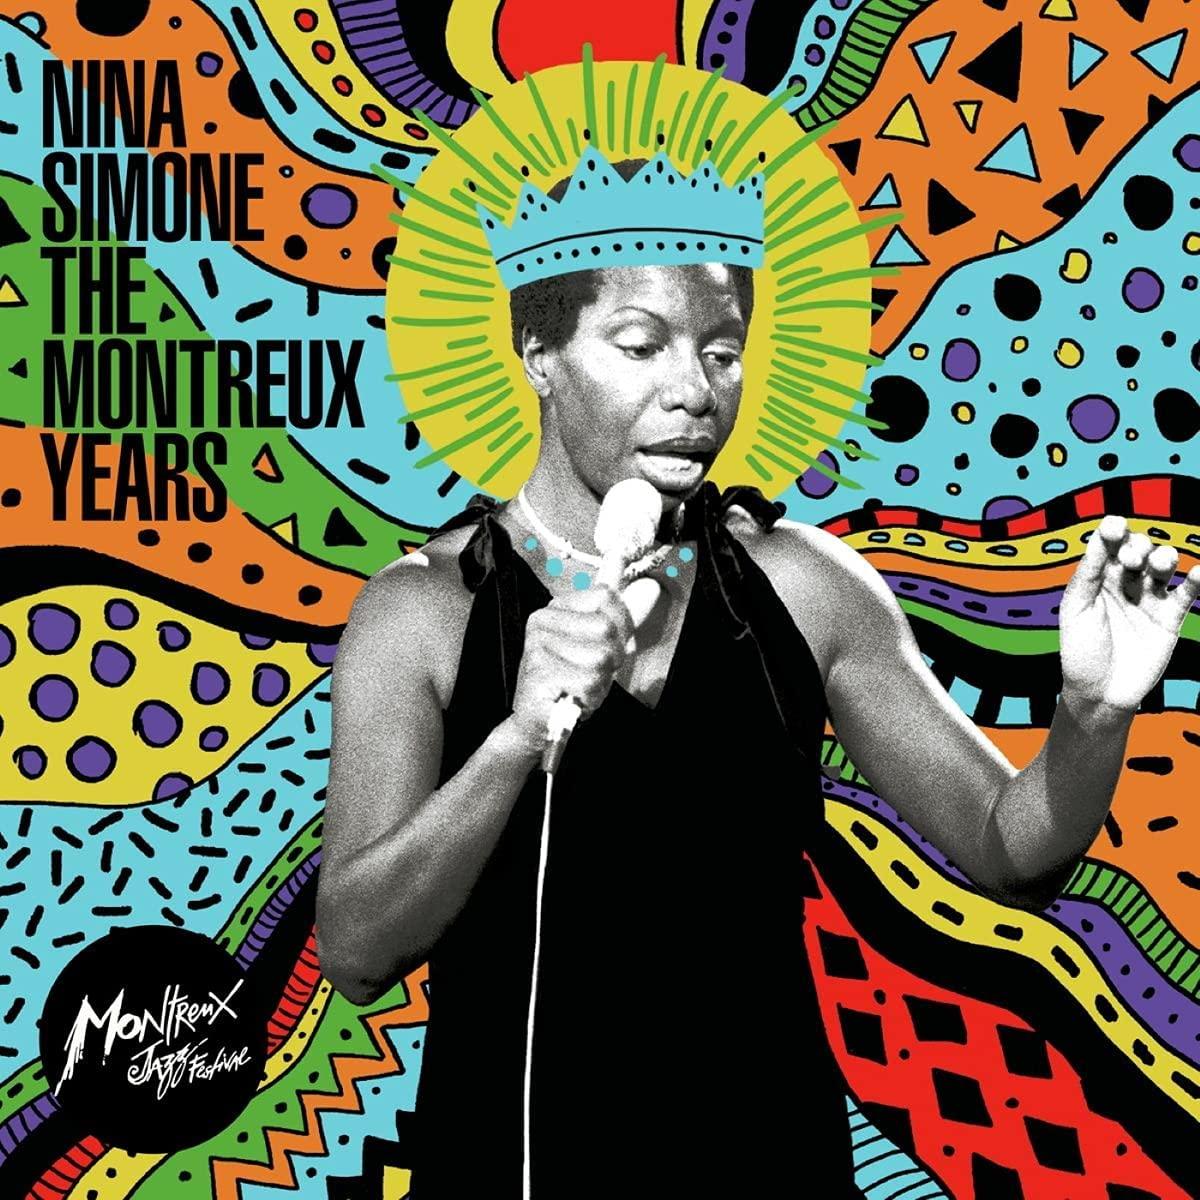 Copertina Vinile 33 giri The Montreux Years [2 LP] di Nina Simone